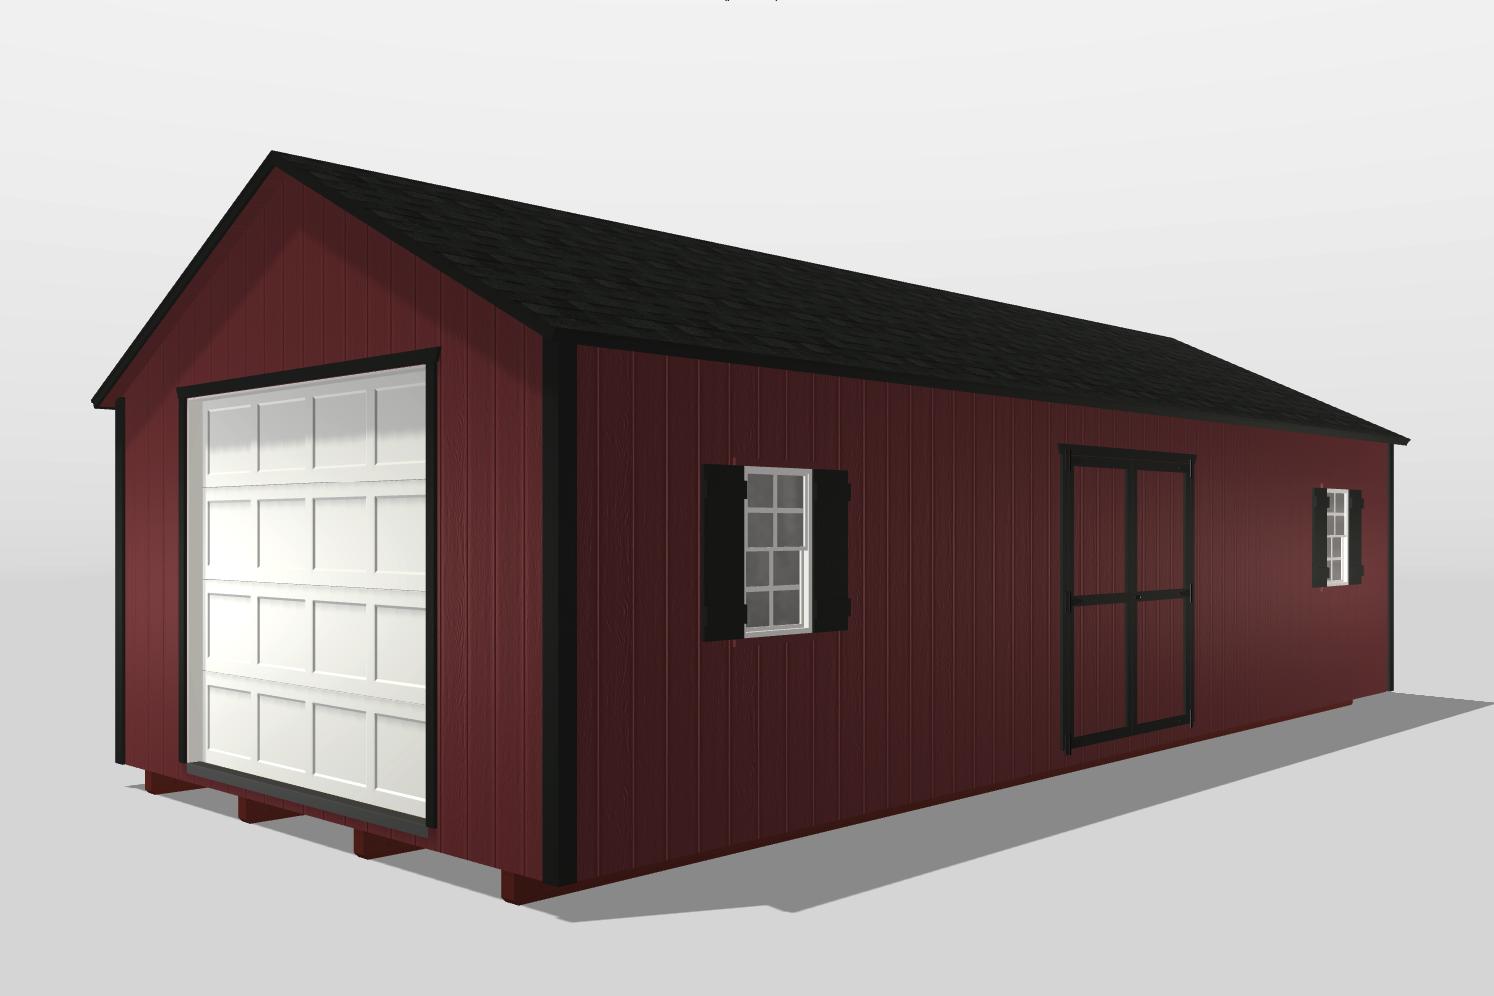 14x32 garage shed for sale vidalia ga